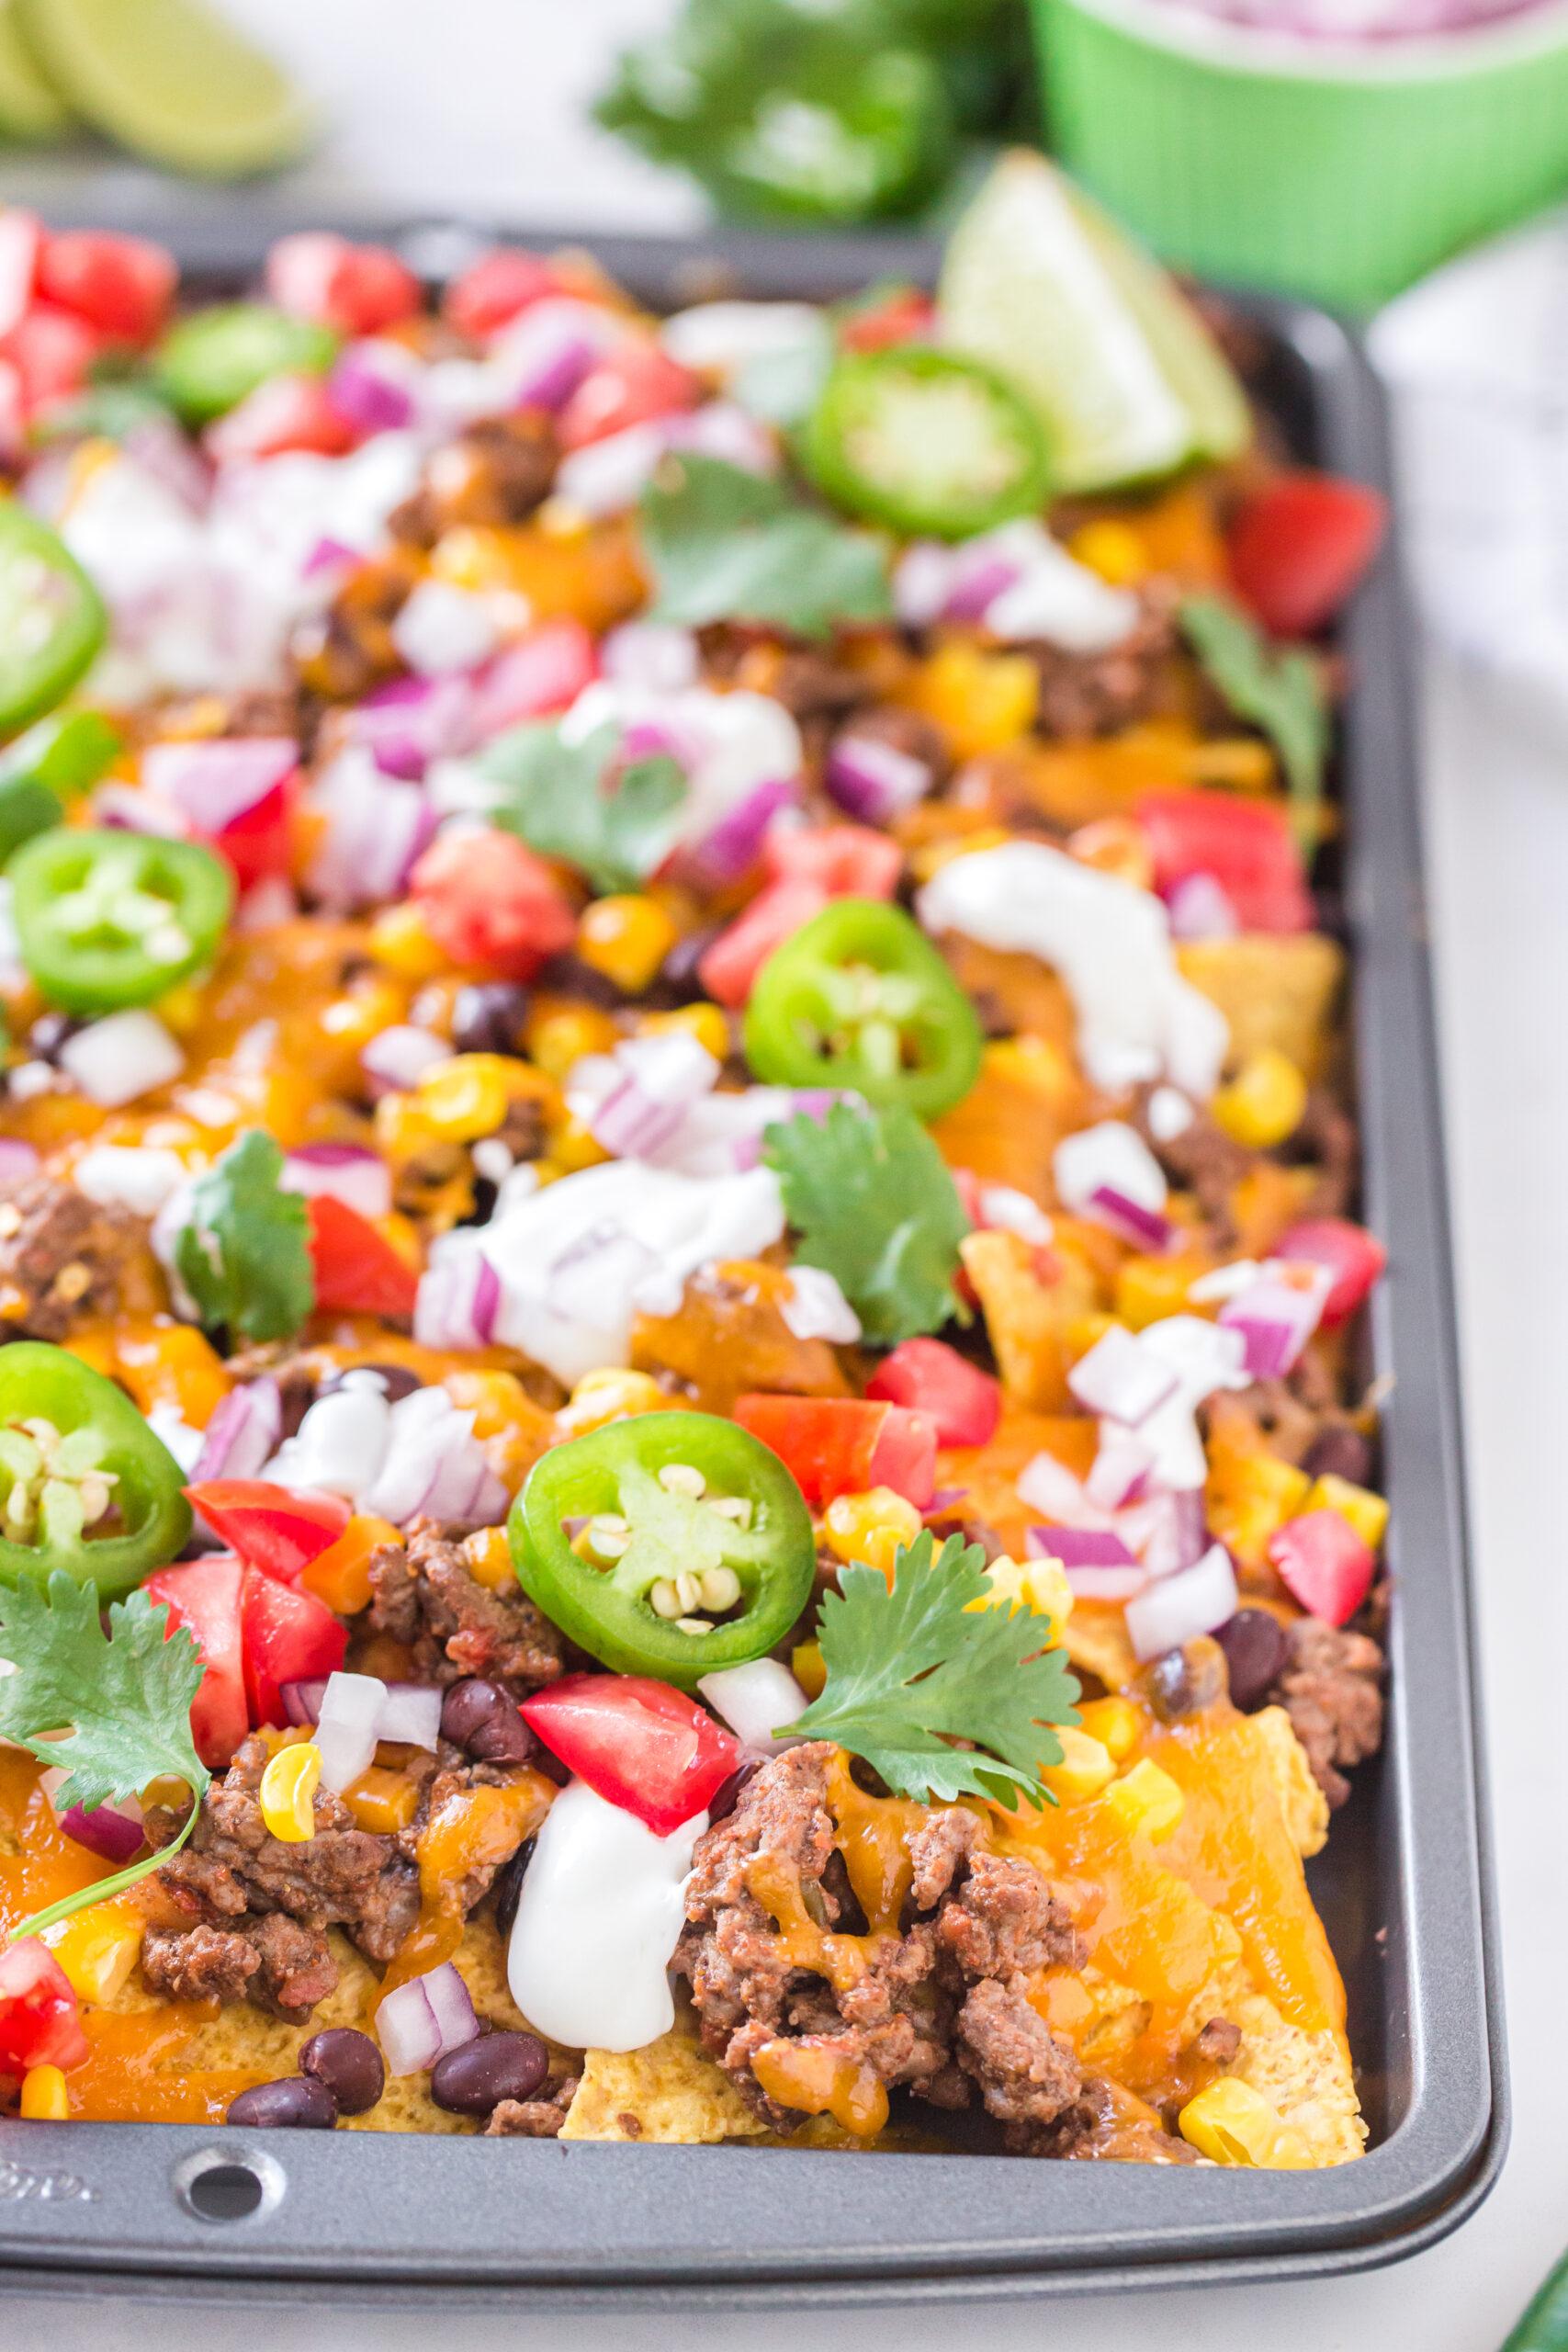 loaded nachos to serve a whole family